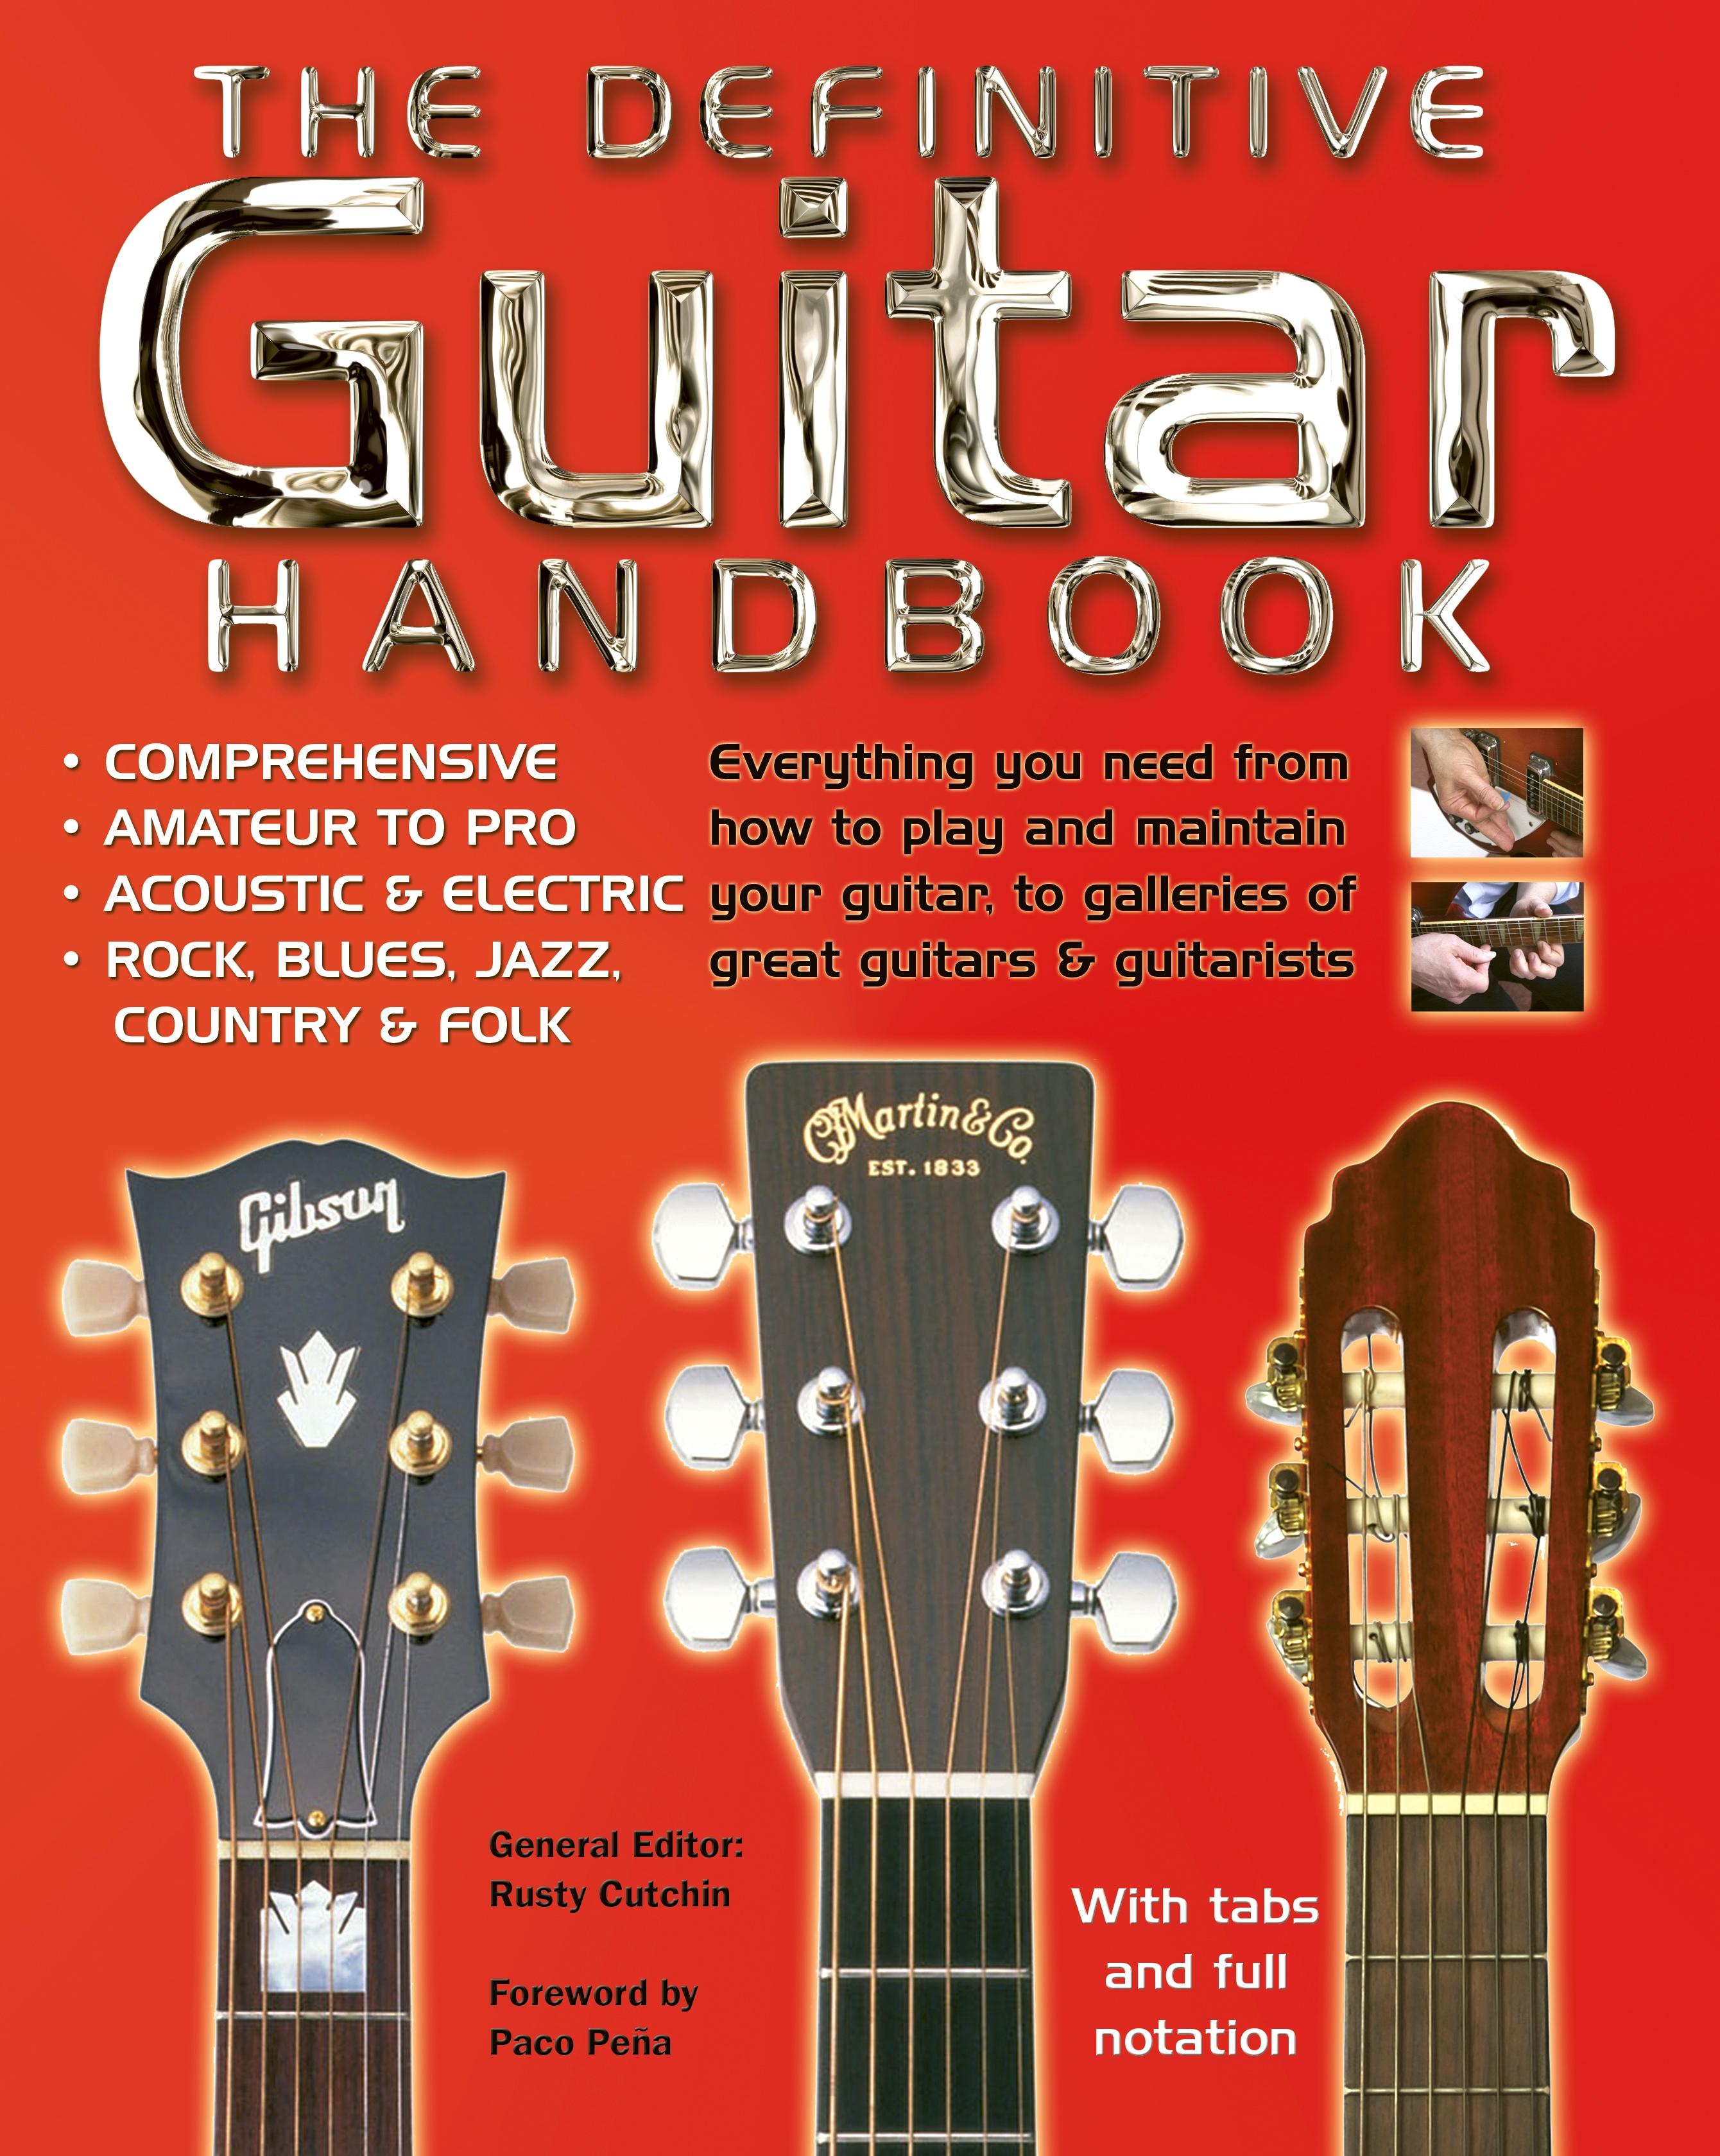 mature-guitar-lick-tionary-women-from-code